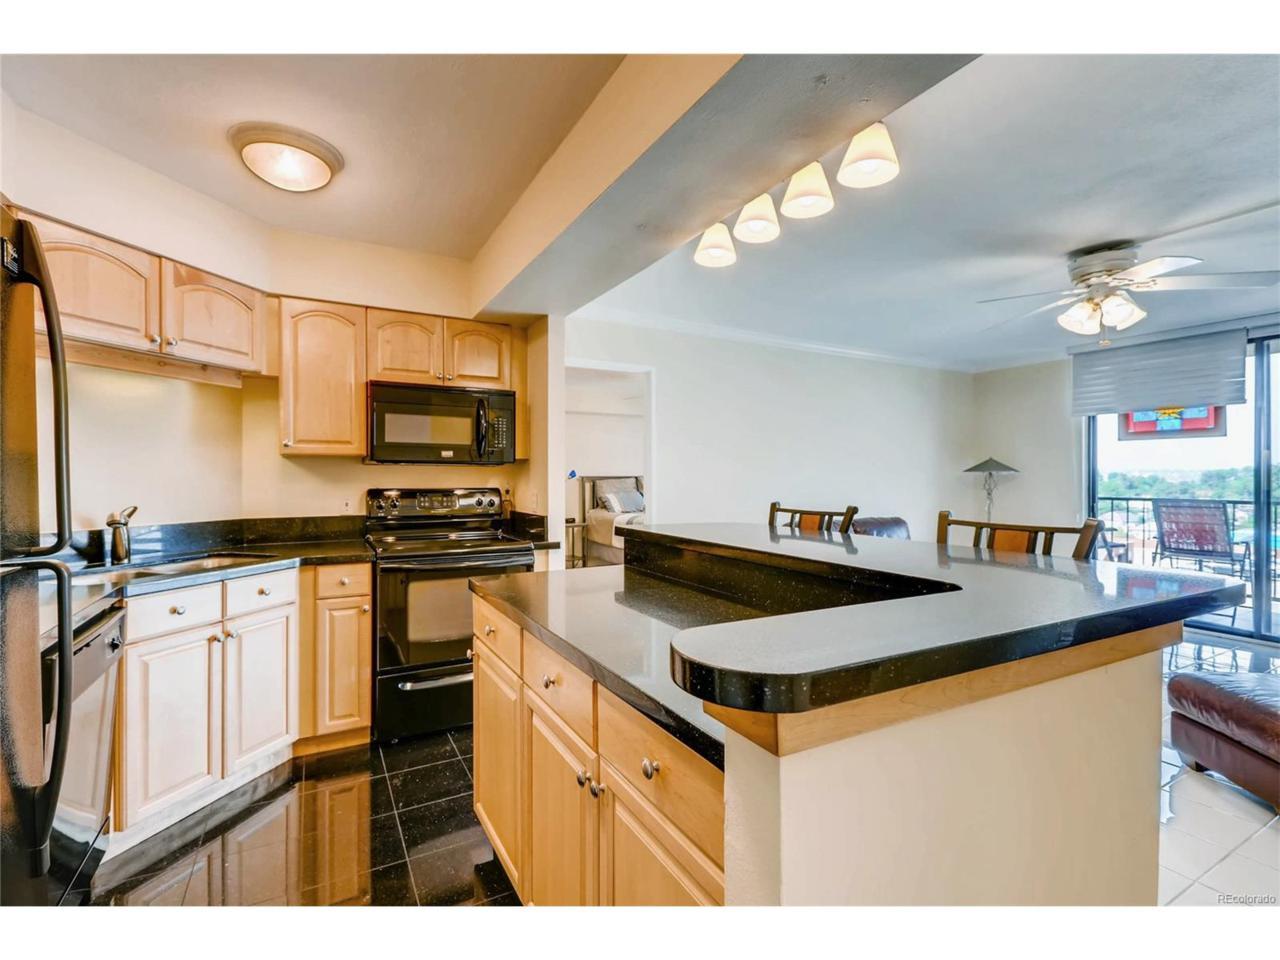 1301 Speer Boulevard #602, Denver, CO 80204 (MLS #2550583) :: 8z Real Estate